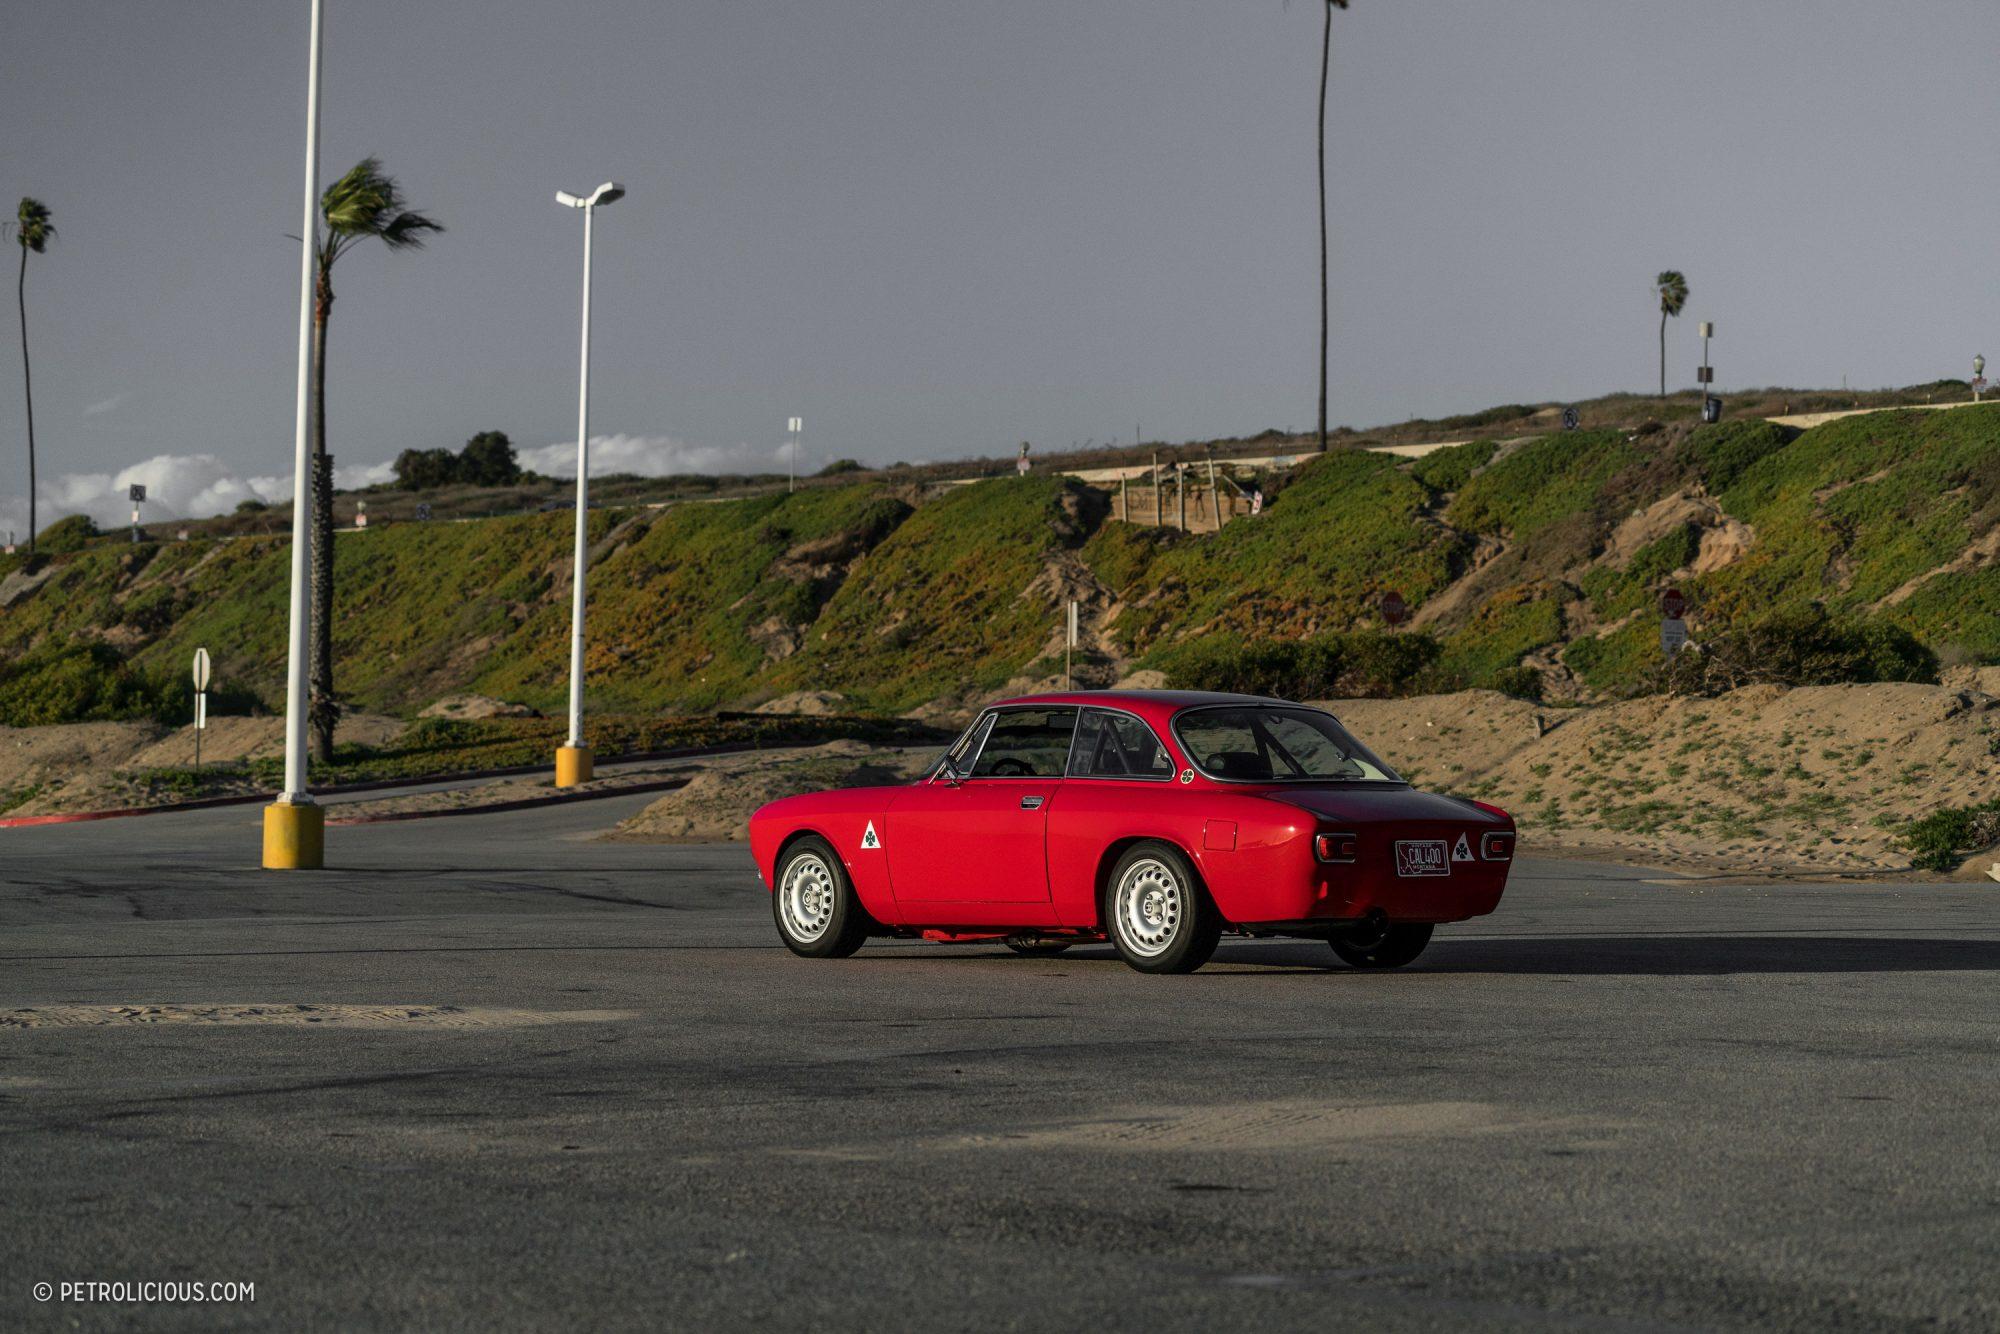 Alfa-Romeo-GTV-2000-film-gallery-24-2000x1334